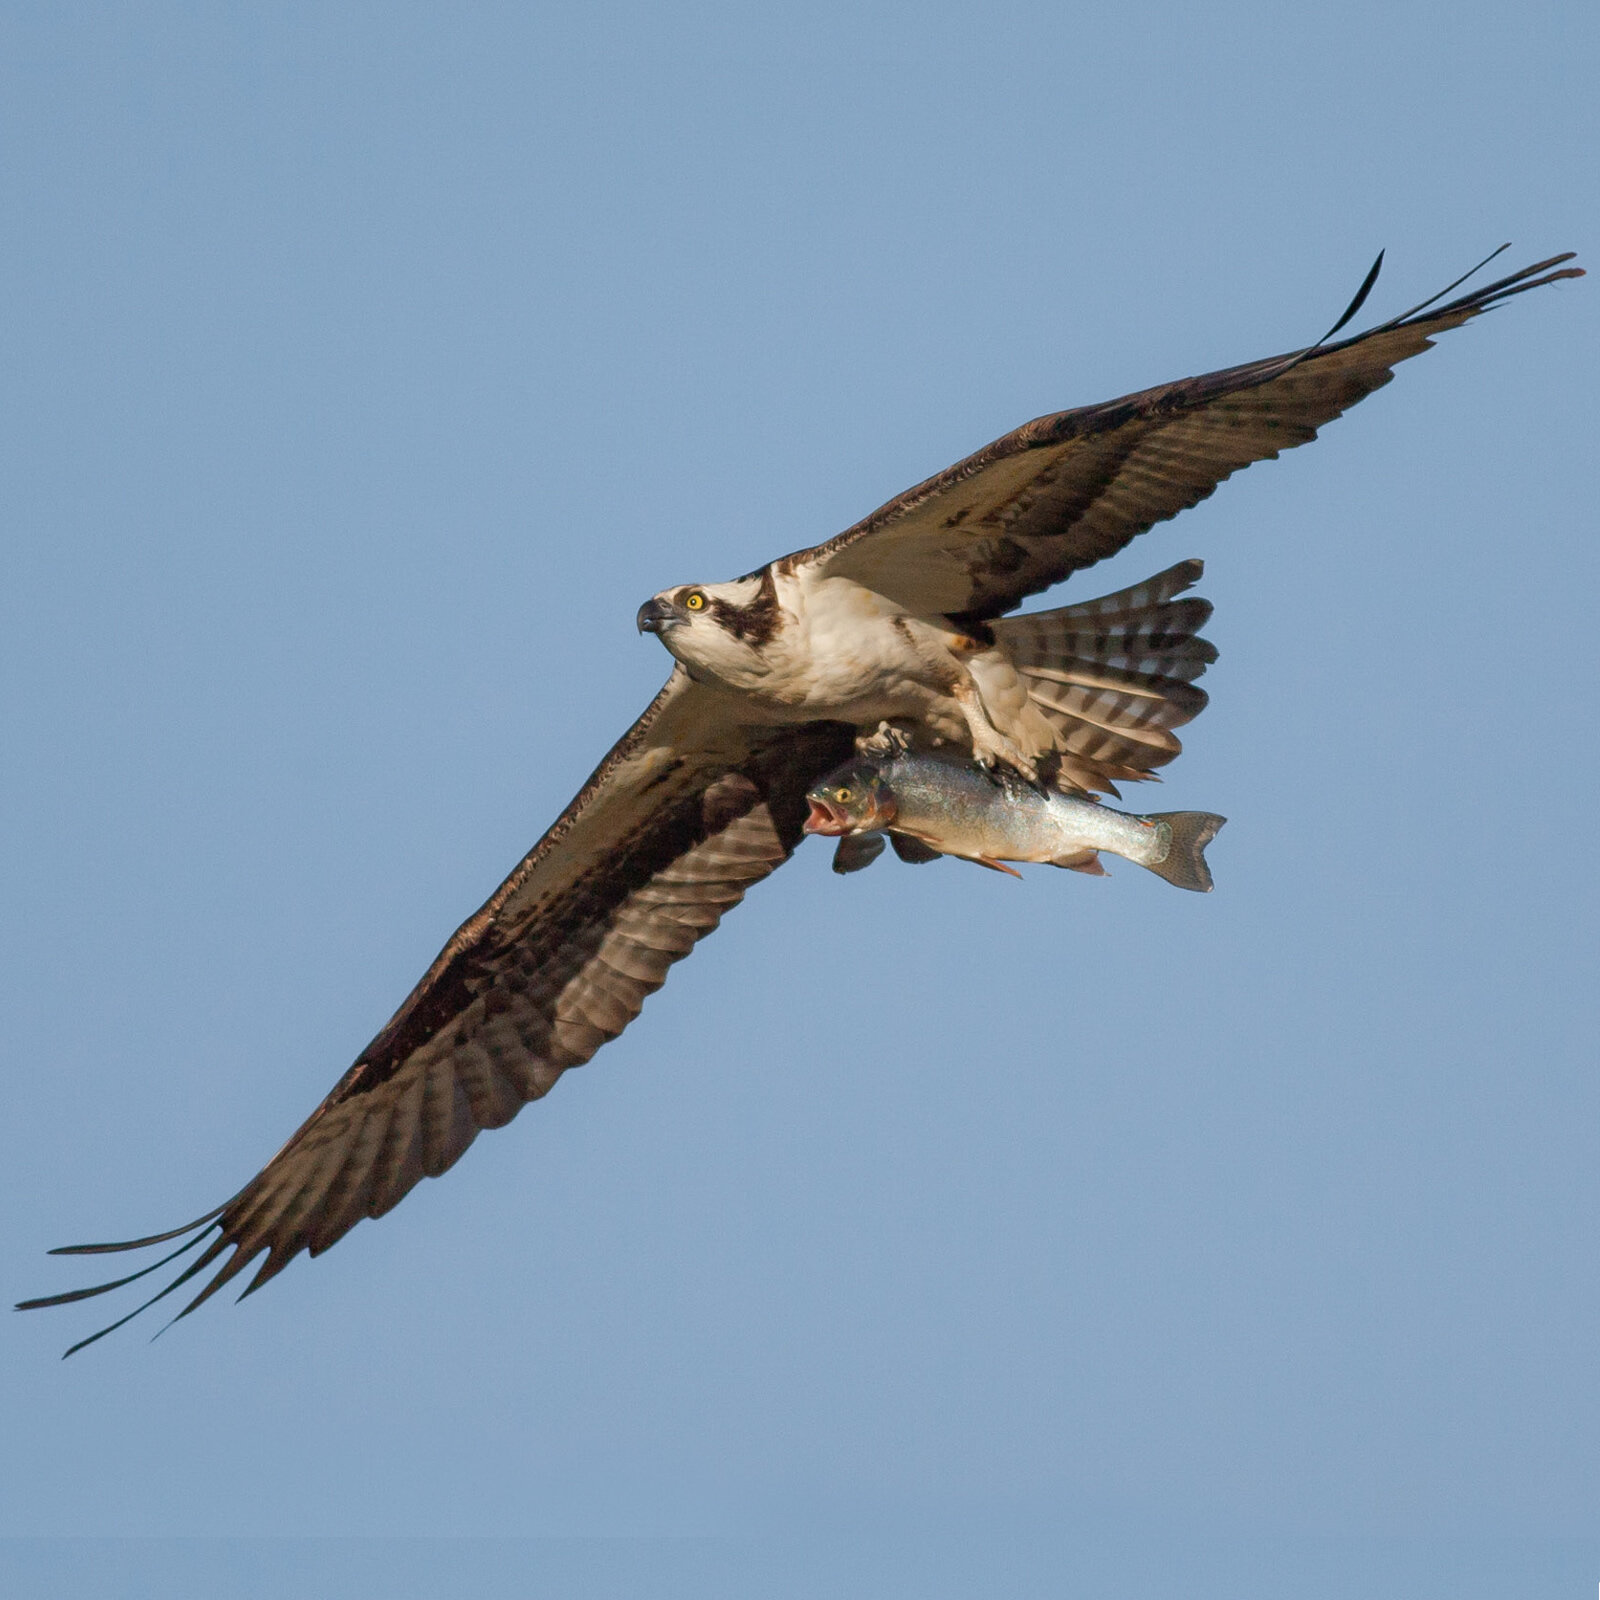 Ospreys generally carry fish head-first to lessen the drag. Photo: Benjamin Knoot / Audubon Photography Awards